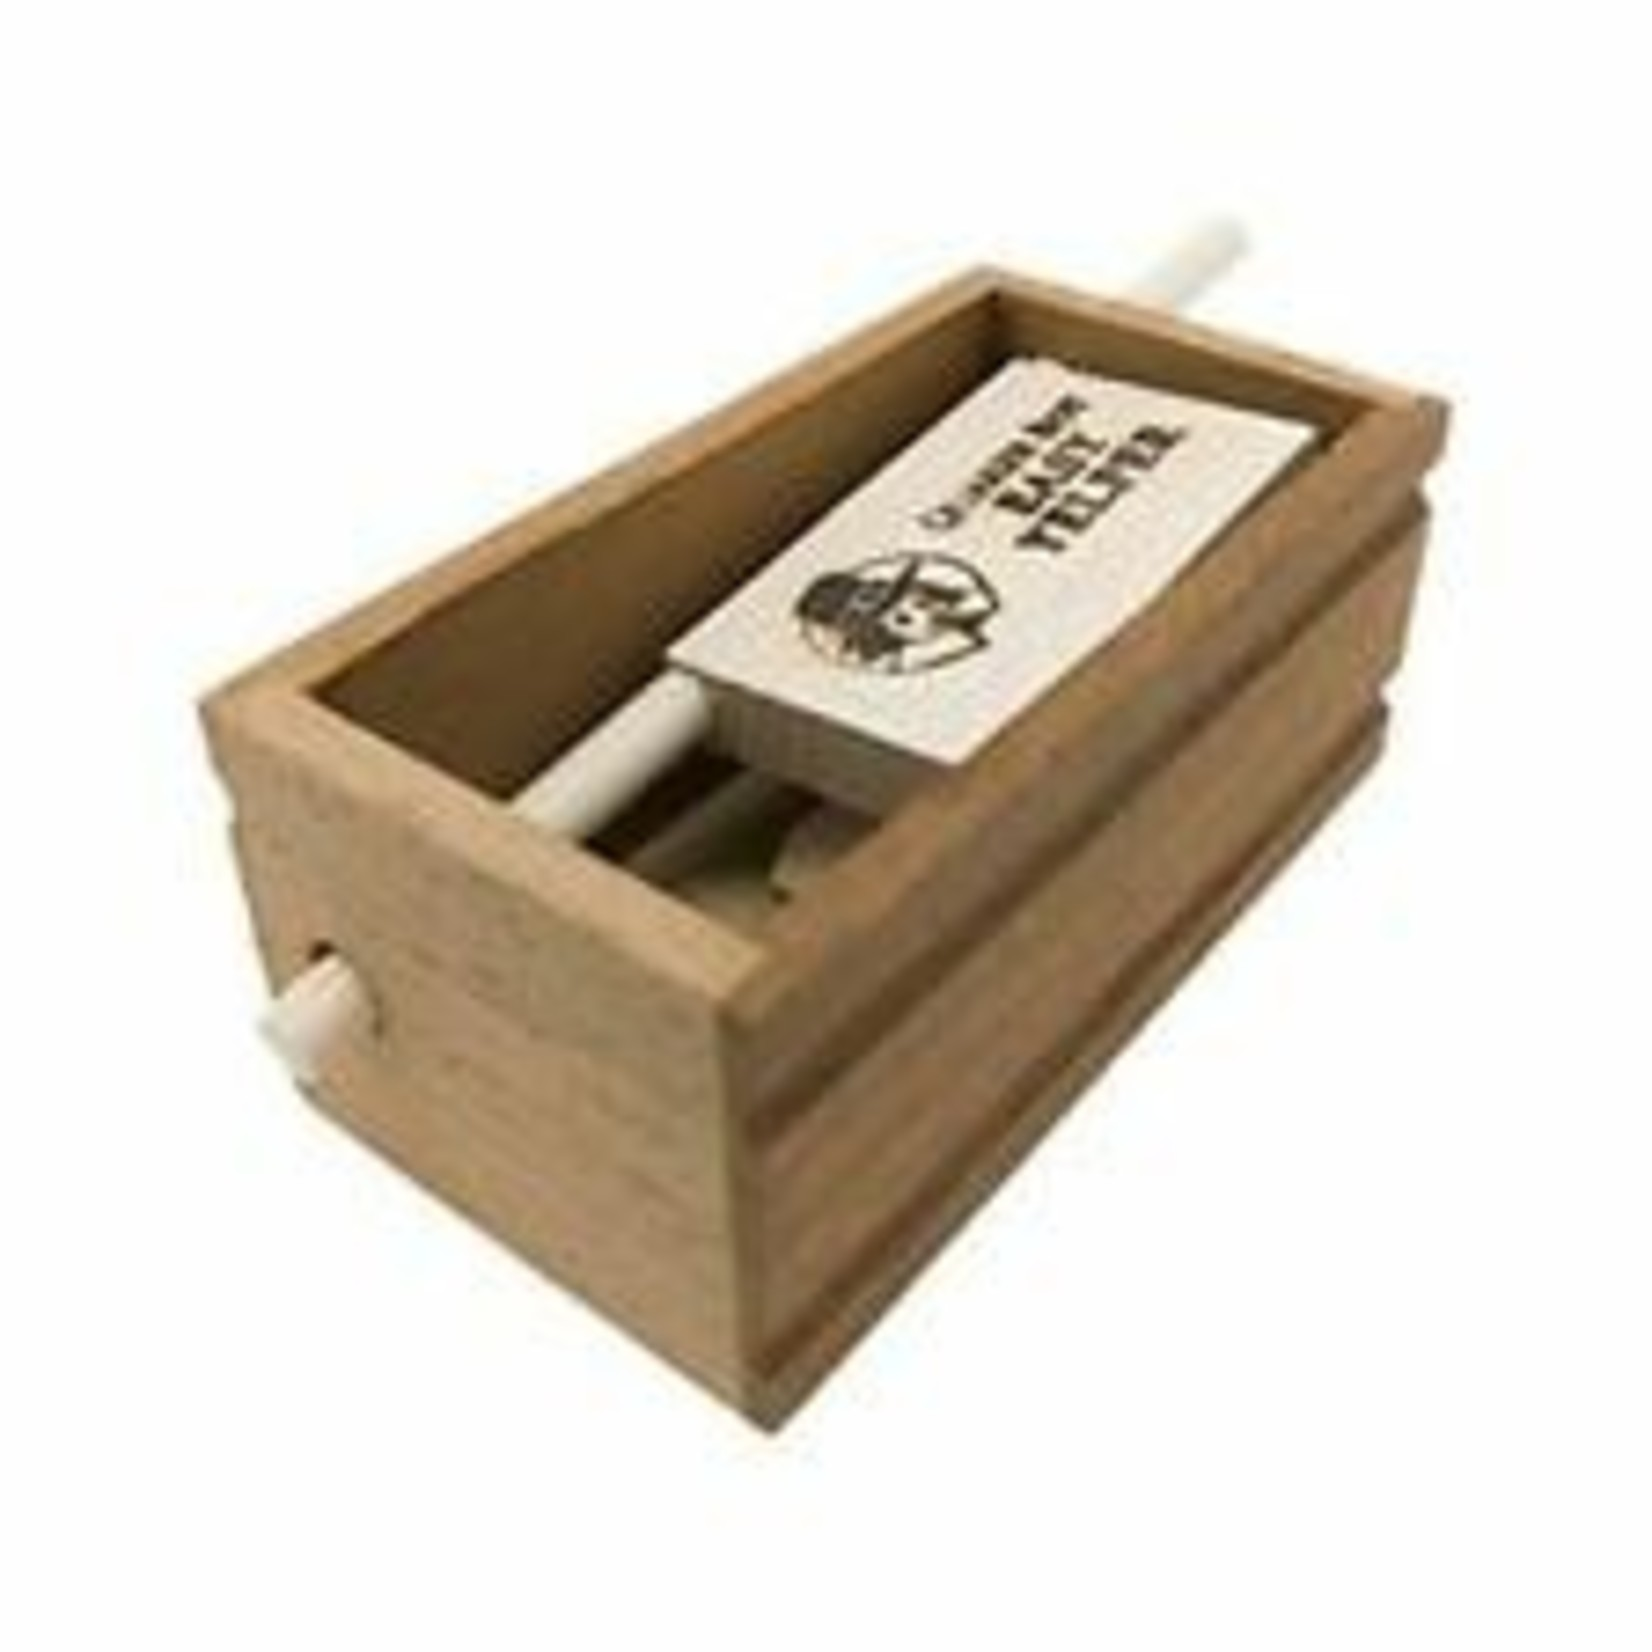 Quaker Boy 13604 Easy Yelper Push Button Turkey Box/Friction Call